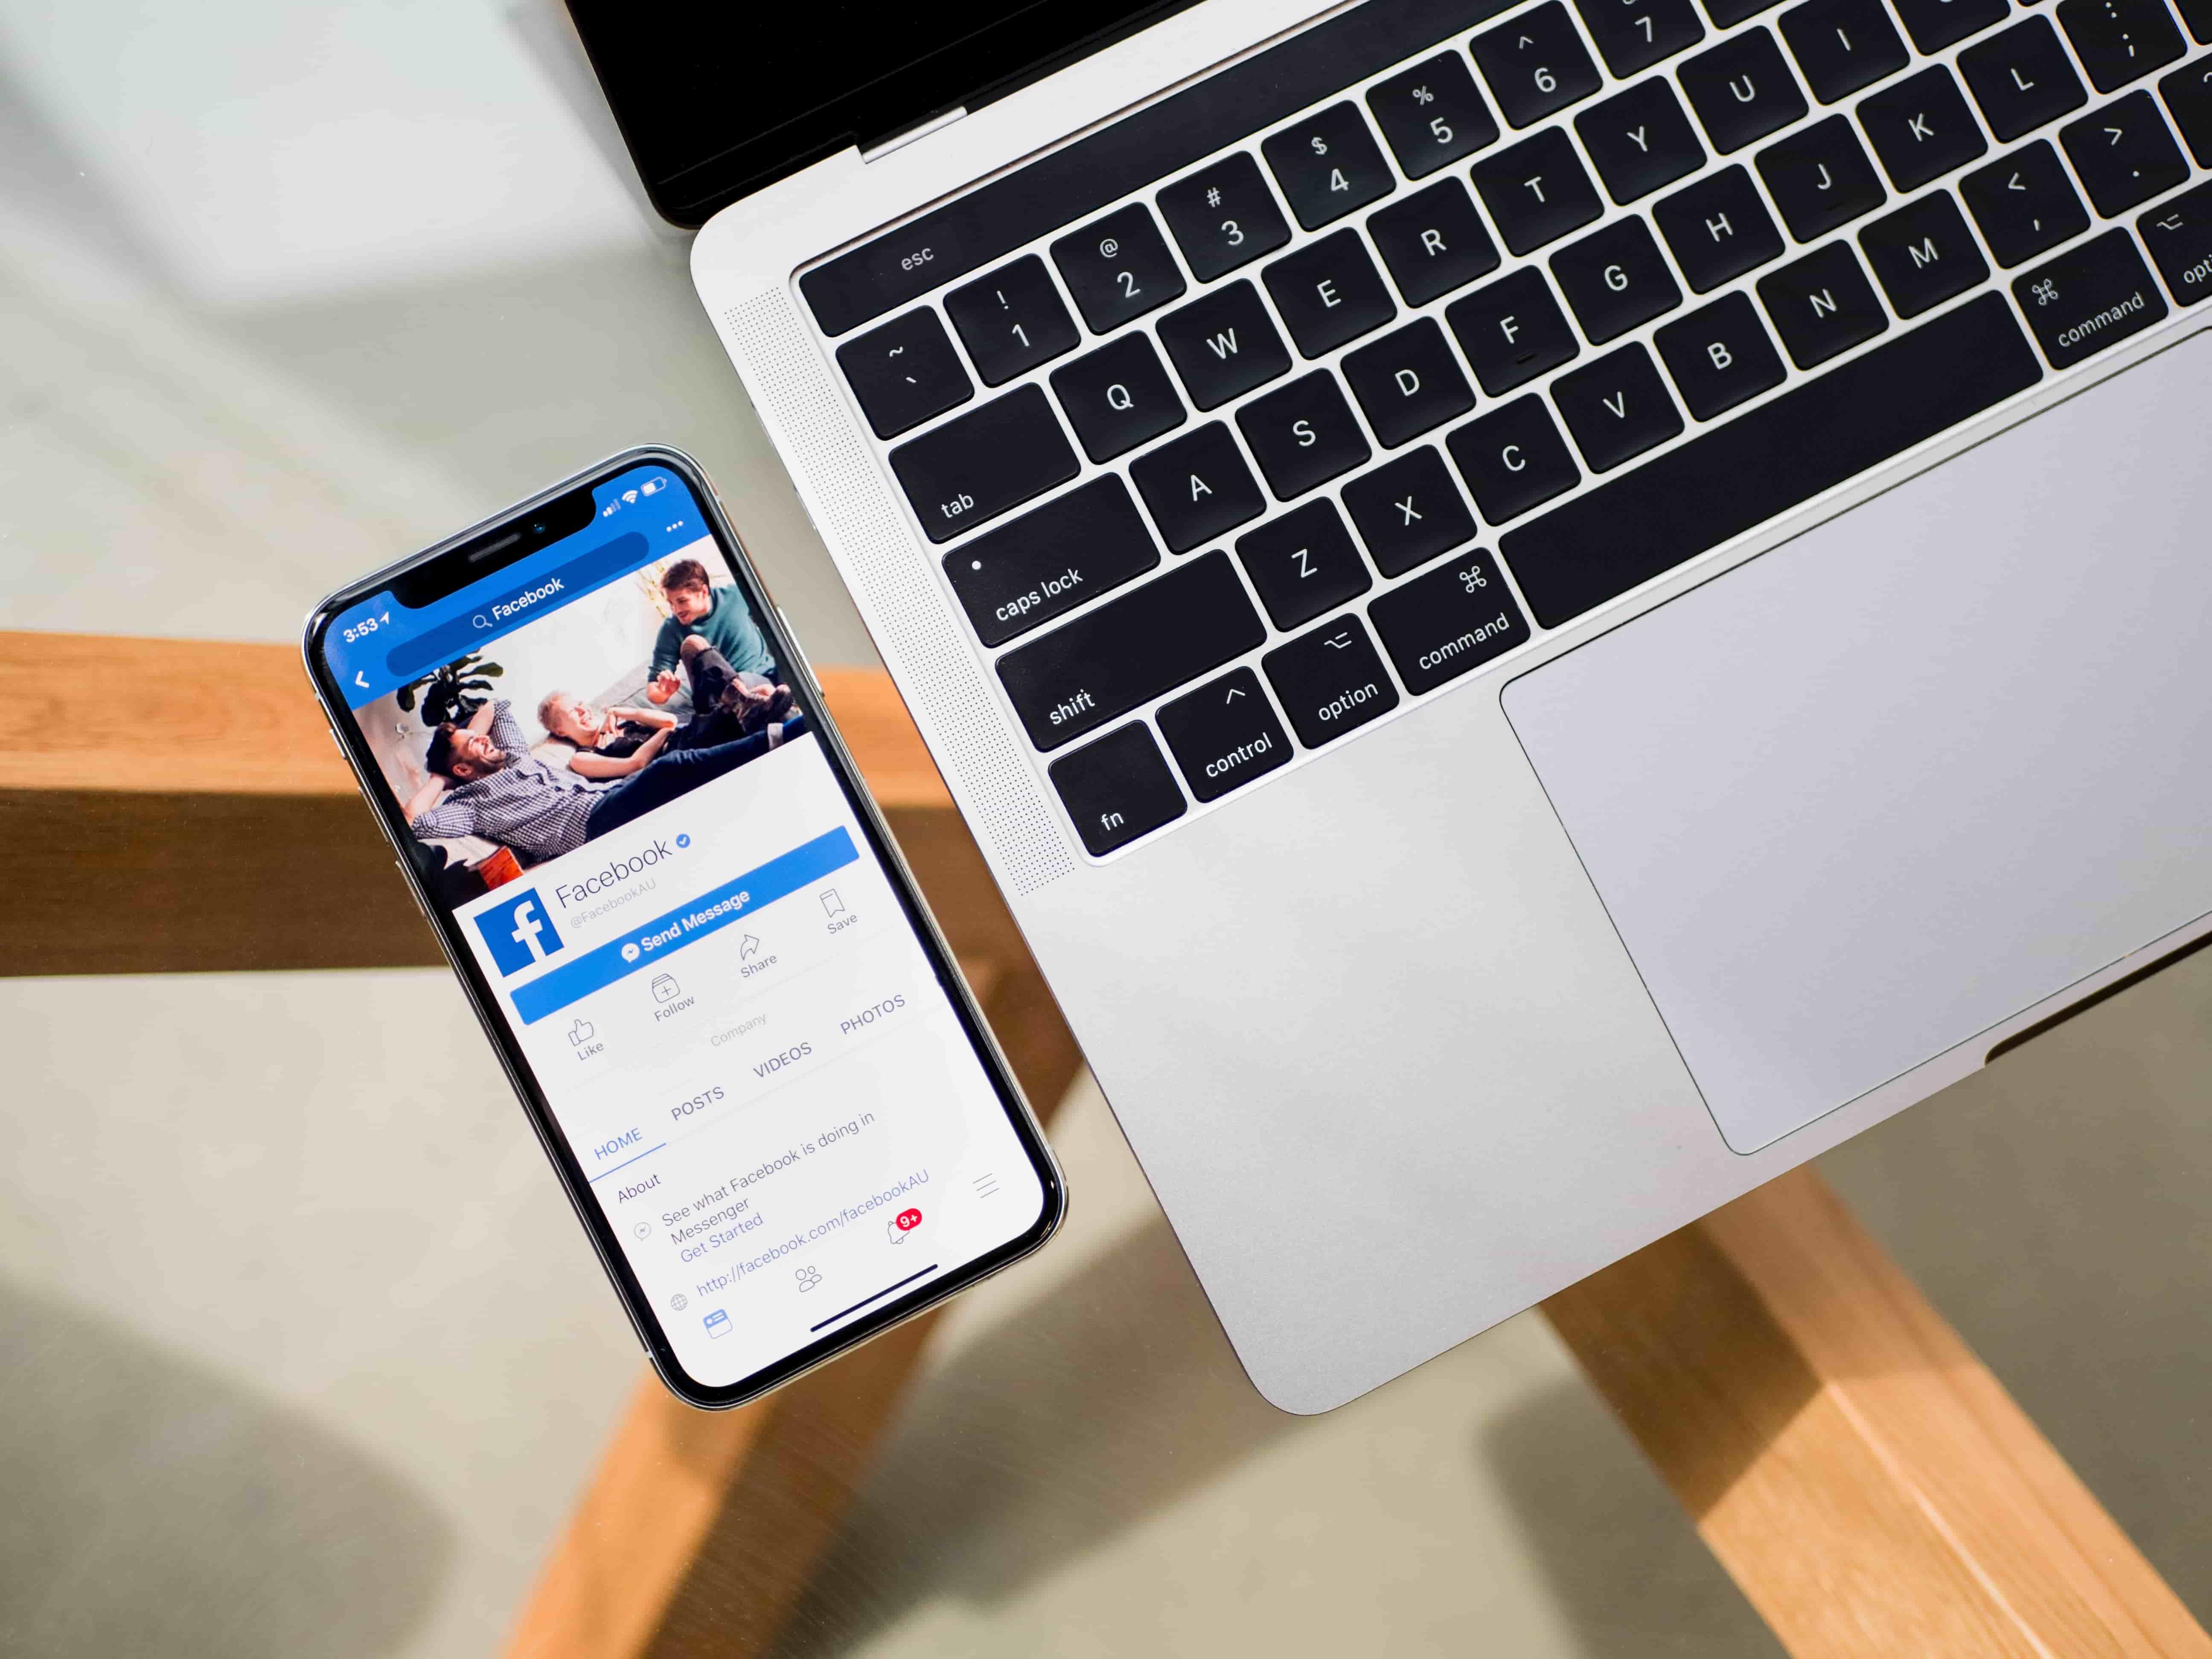 FACEBOOK-Mirjam-Ehler-me.agentur-social-media-web-design-online-marketing-ketsch-bw